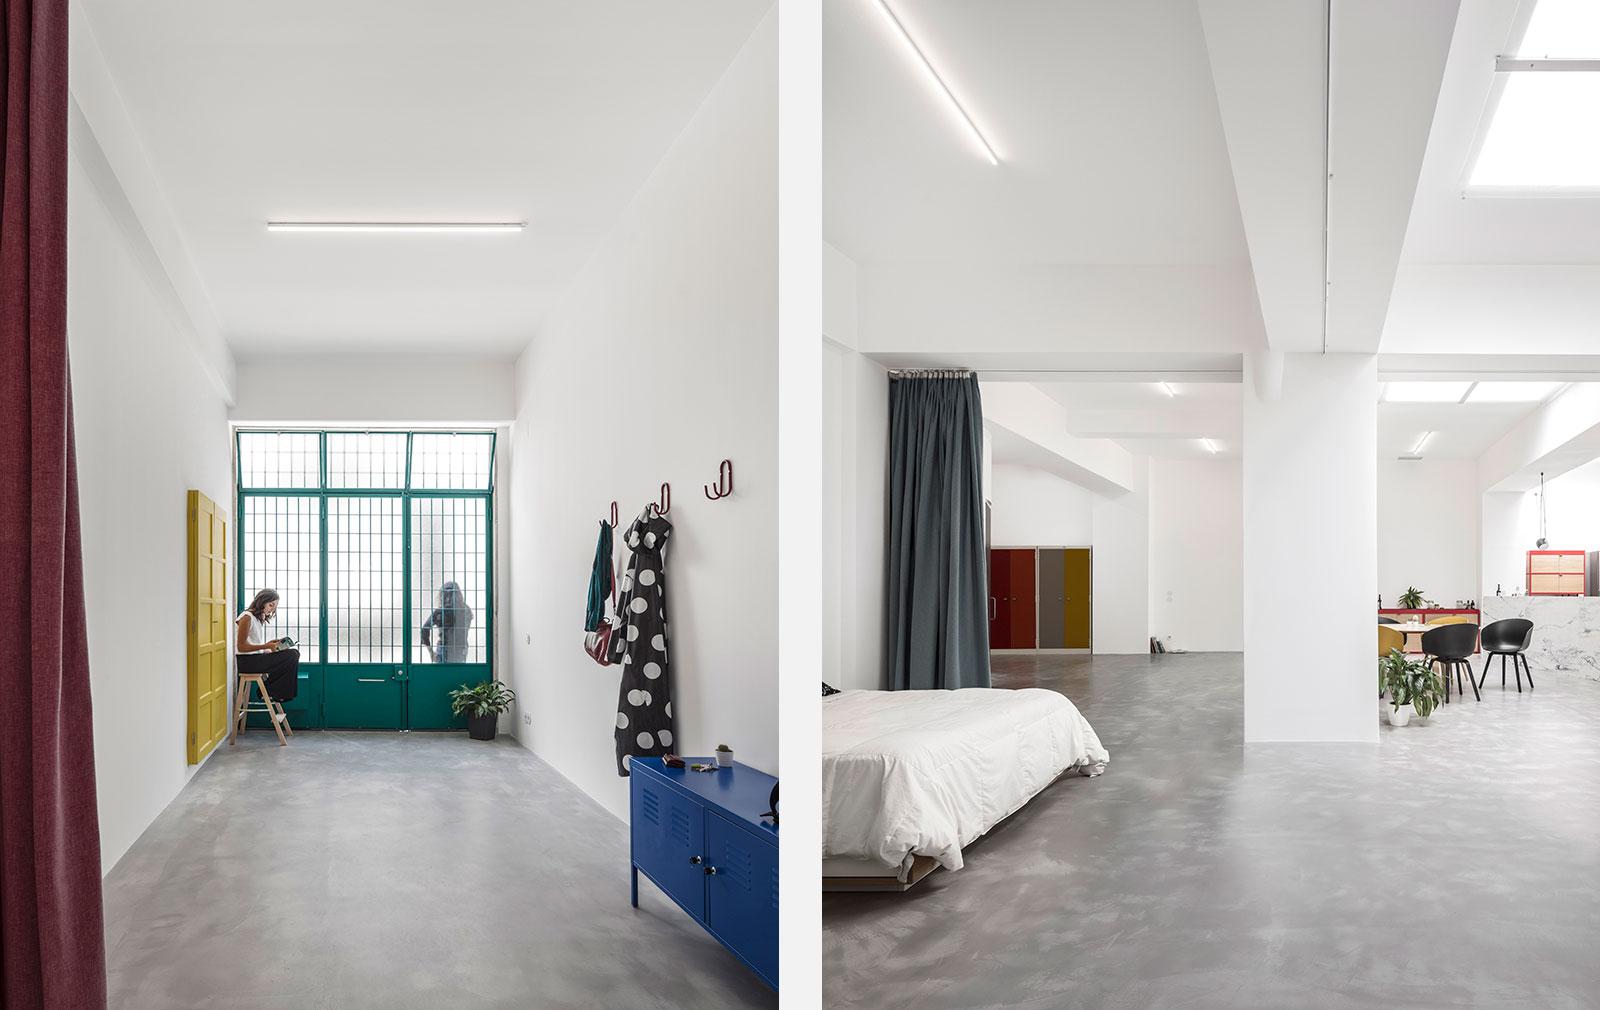 A garage conversion by Portuguese architecture practice Atelier Fala